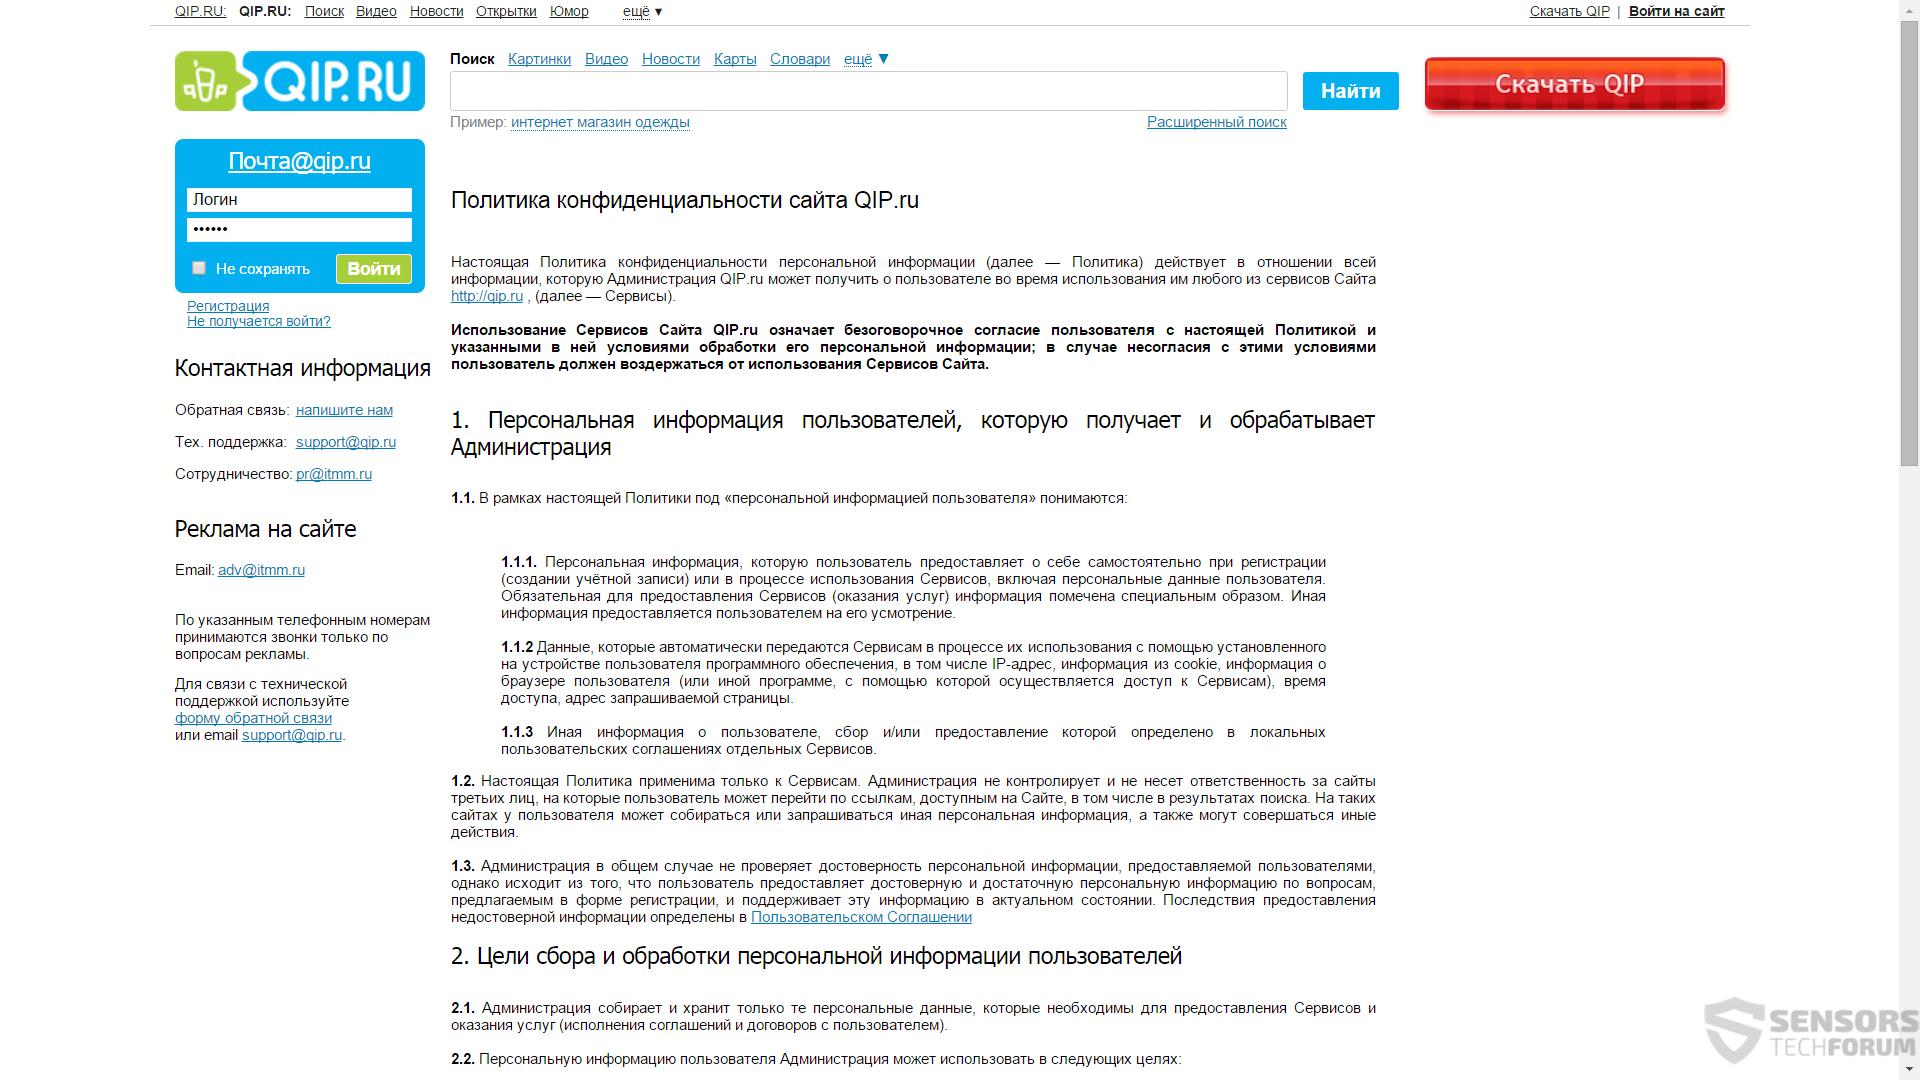 SensorsTechForum-search-qip-ru-privacy-policy